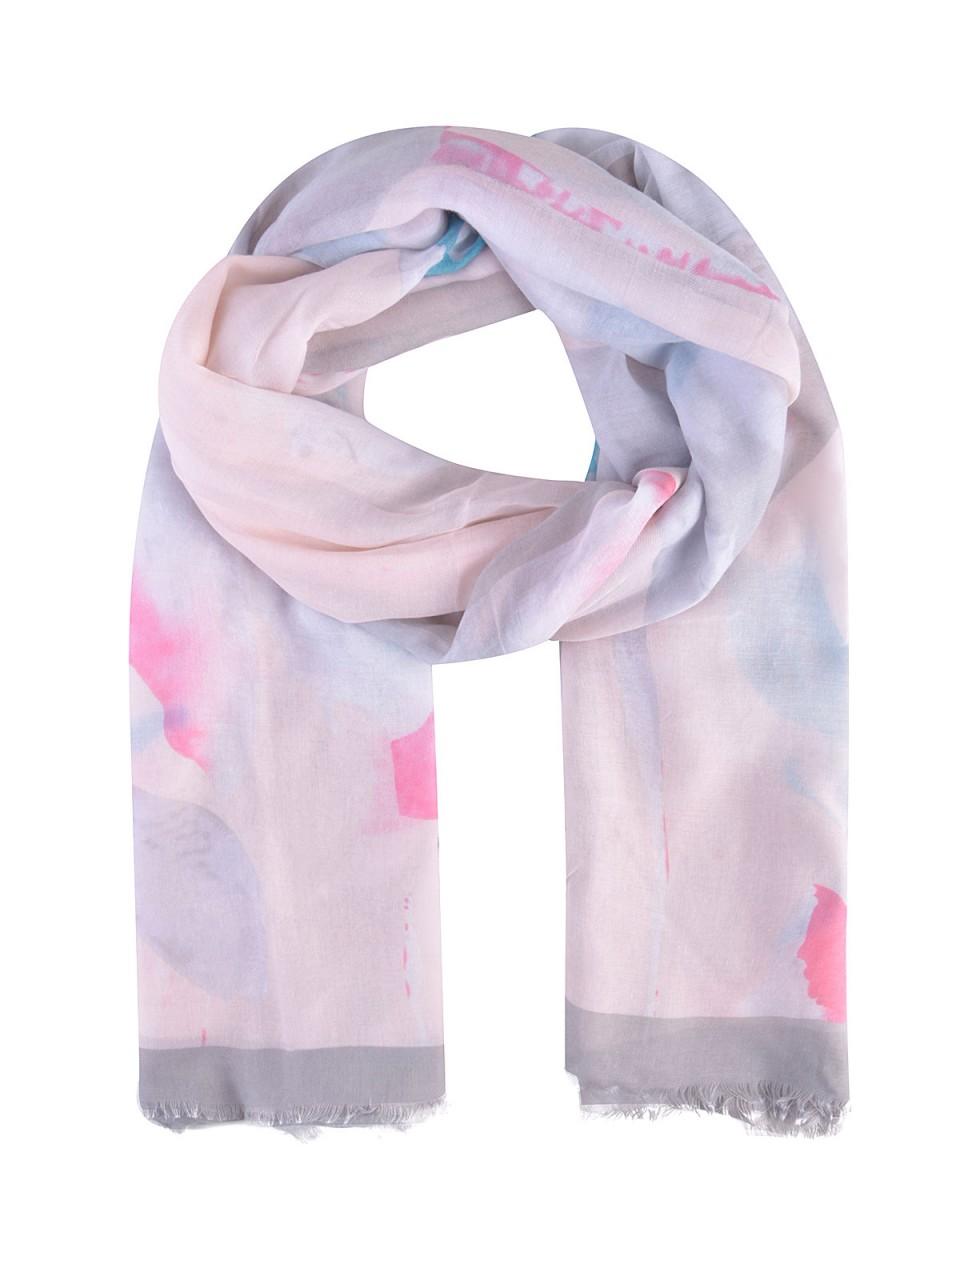 Schals - SMITH SOUL Damen Tuch, rosa  - Onlineshop Designermode.com